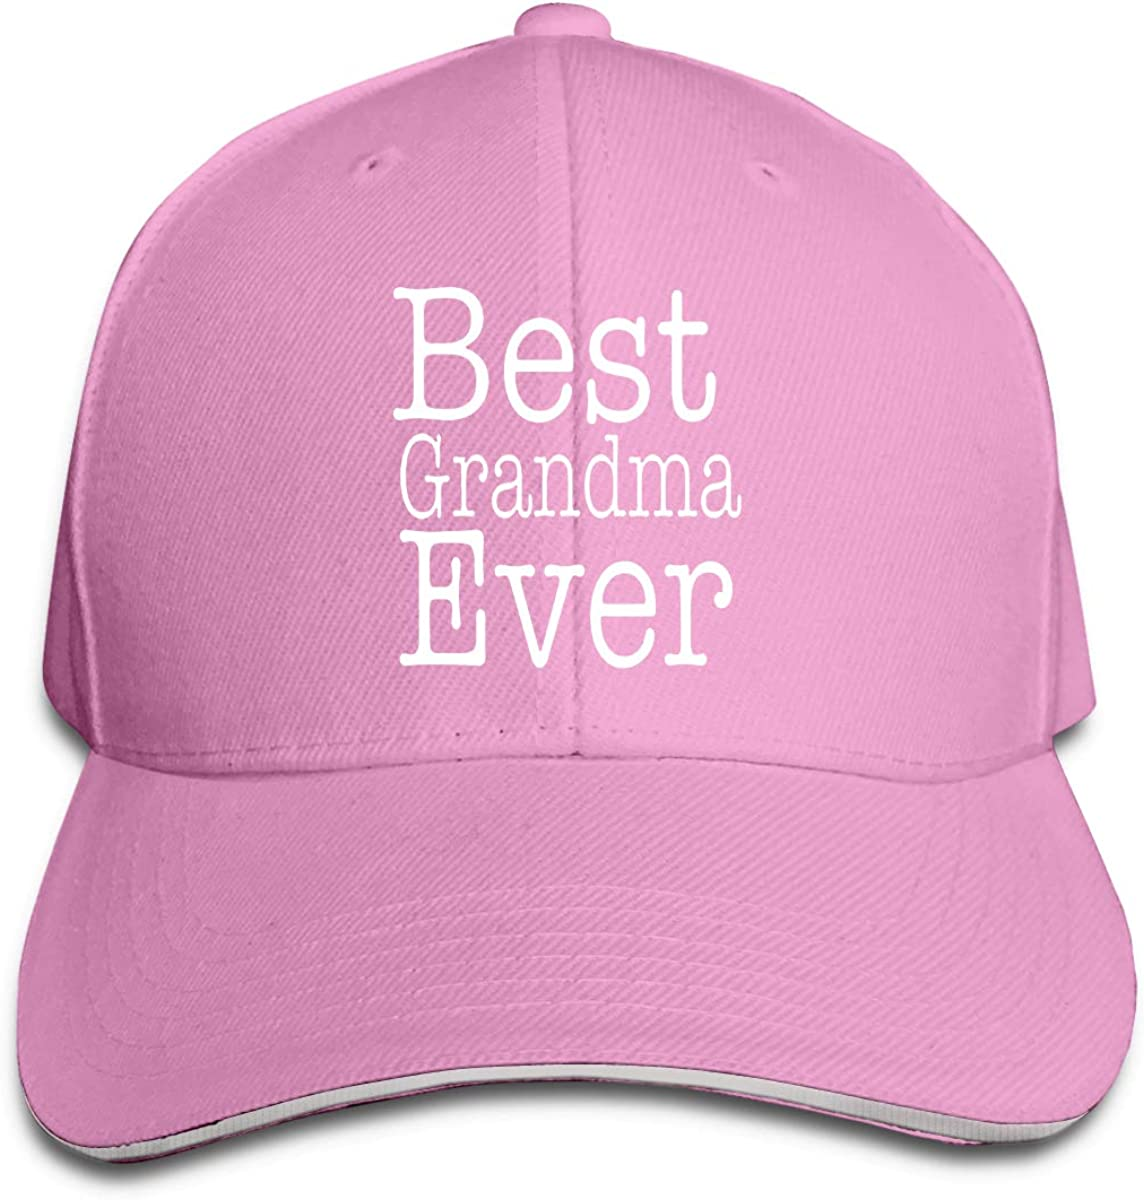 Best Grandma Ever Men and Women Adjustable Sandwich Peaked Baseball Cap